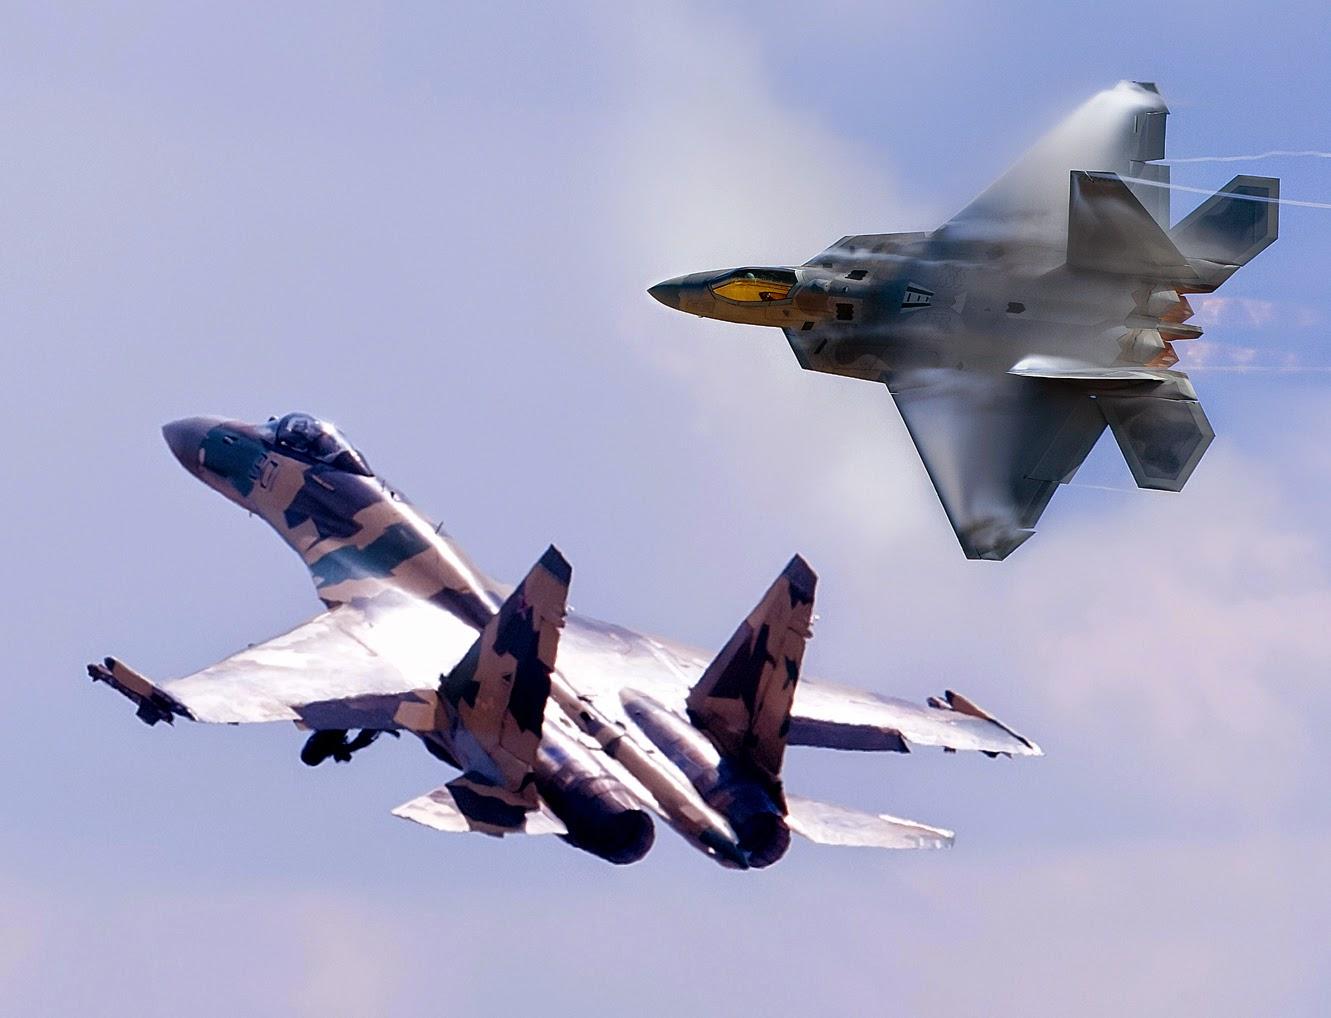 sukhoi su-35 vs f-22 raptor